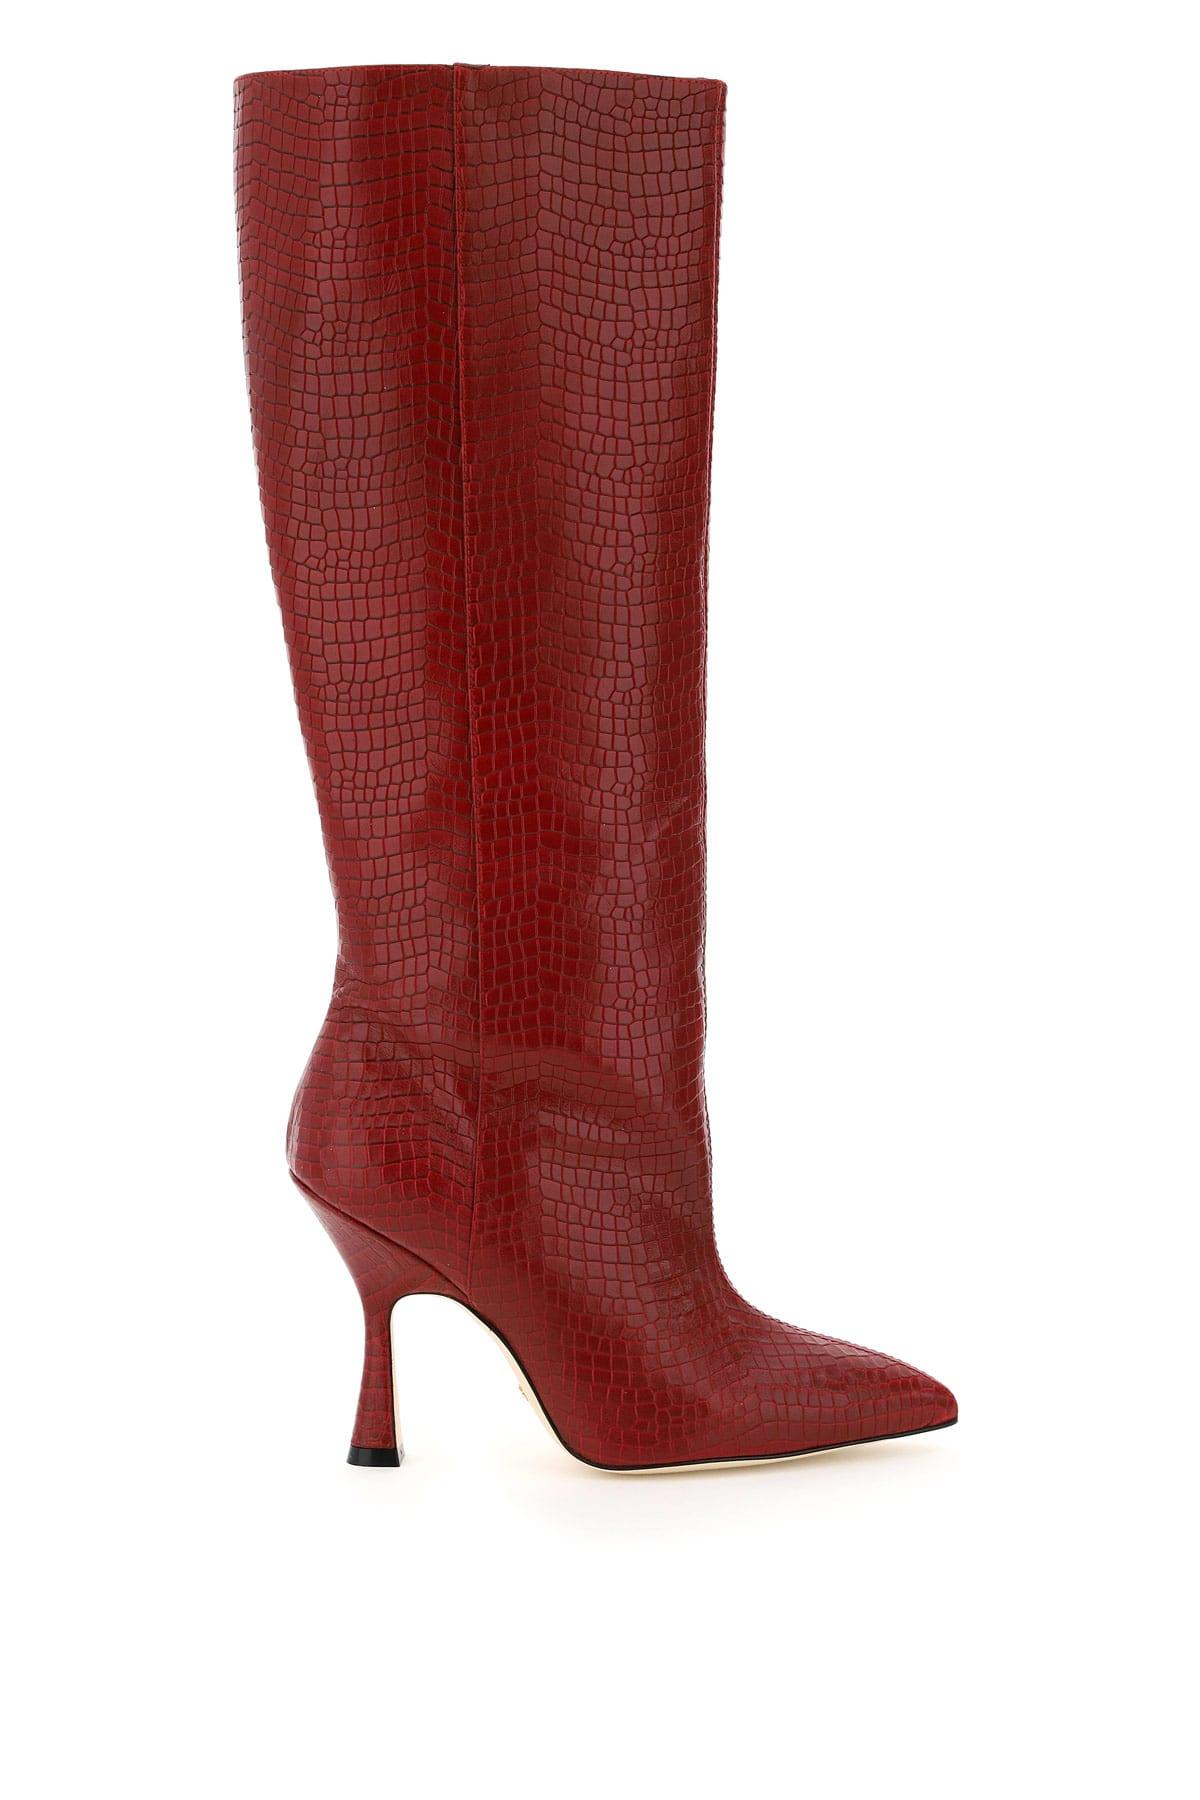 Stuart Weitzman Parton Crocodile Embossed Leather Boots